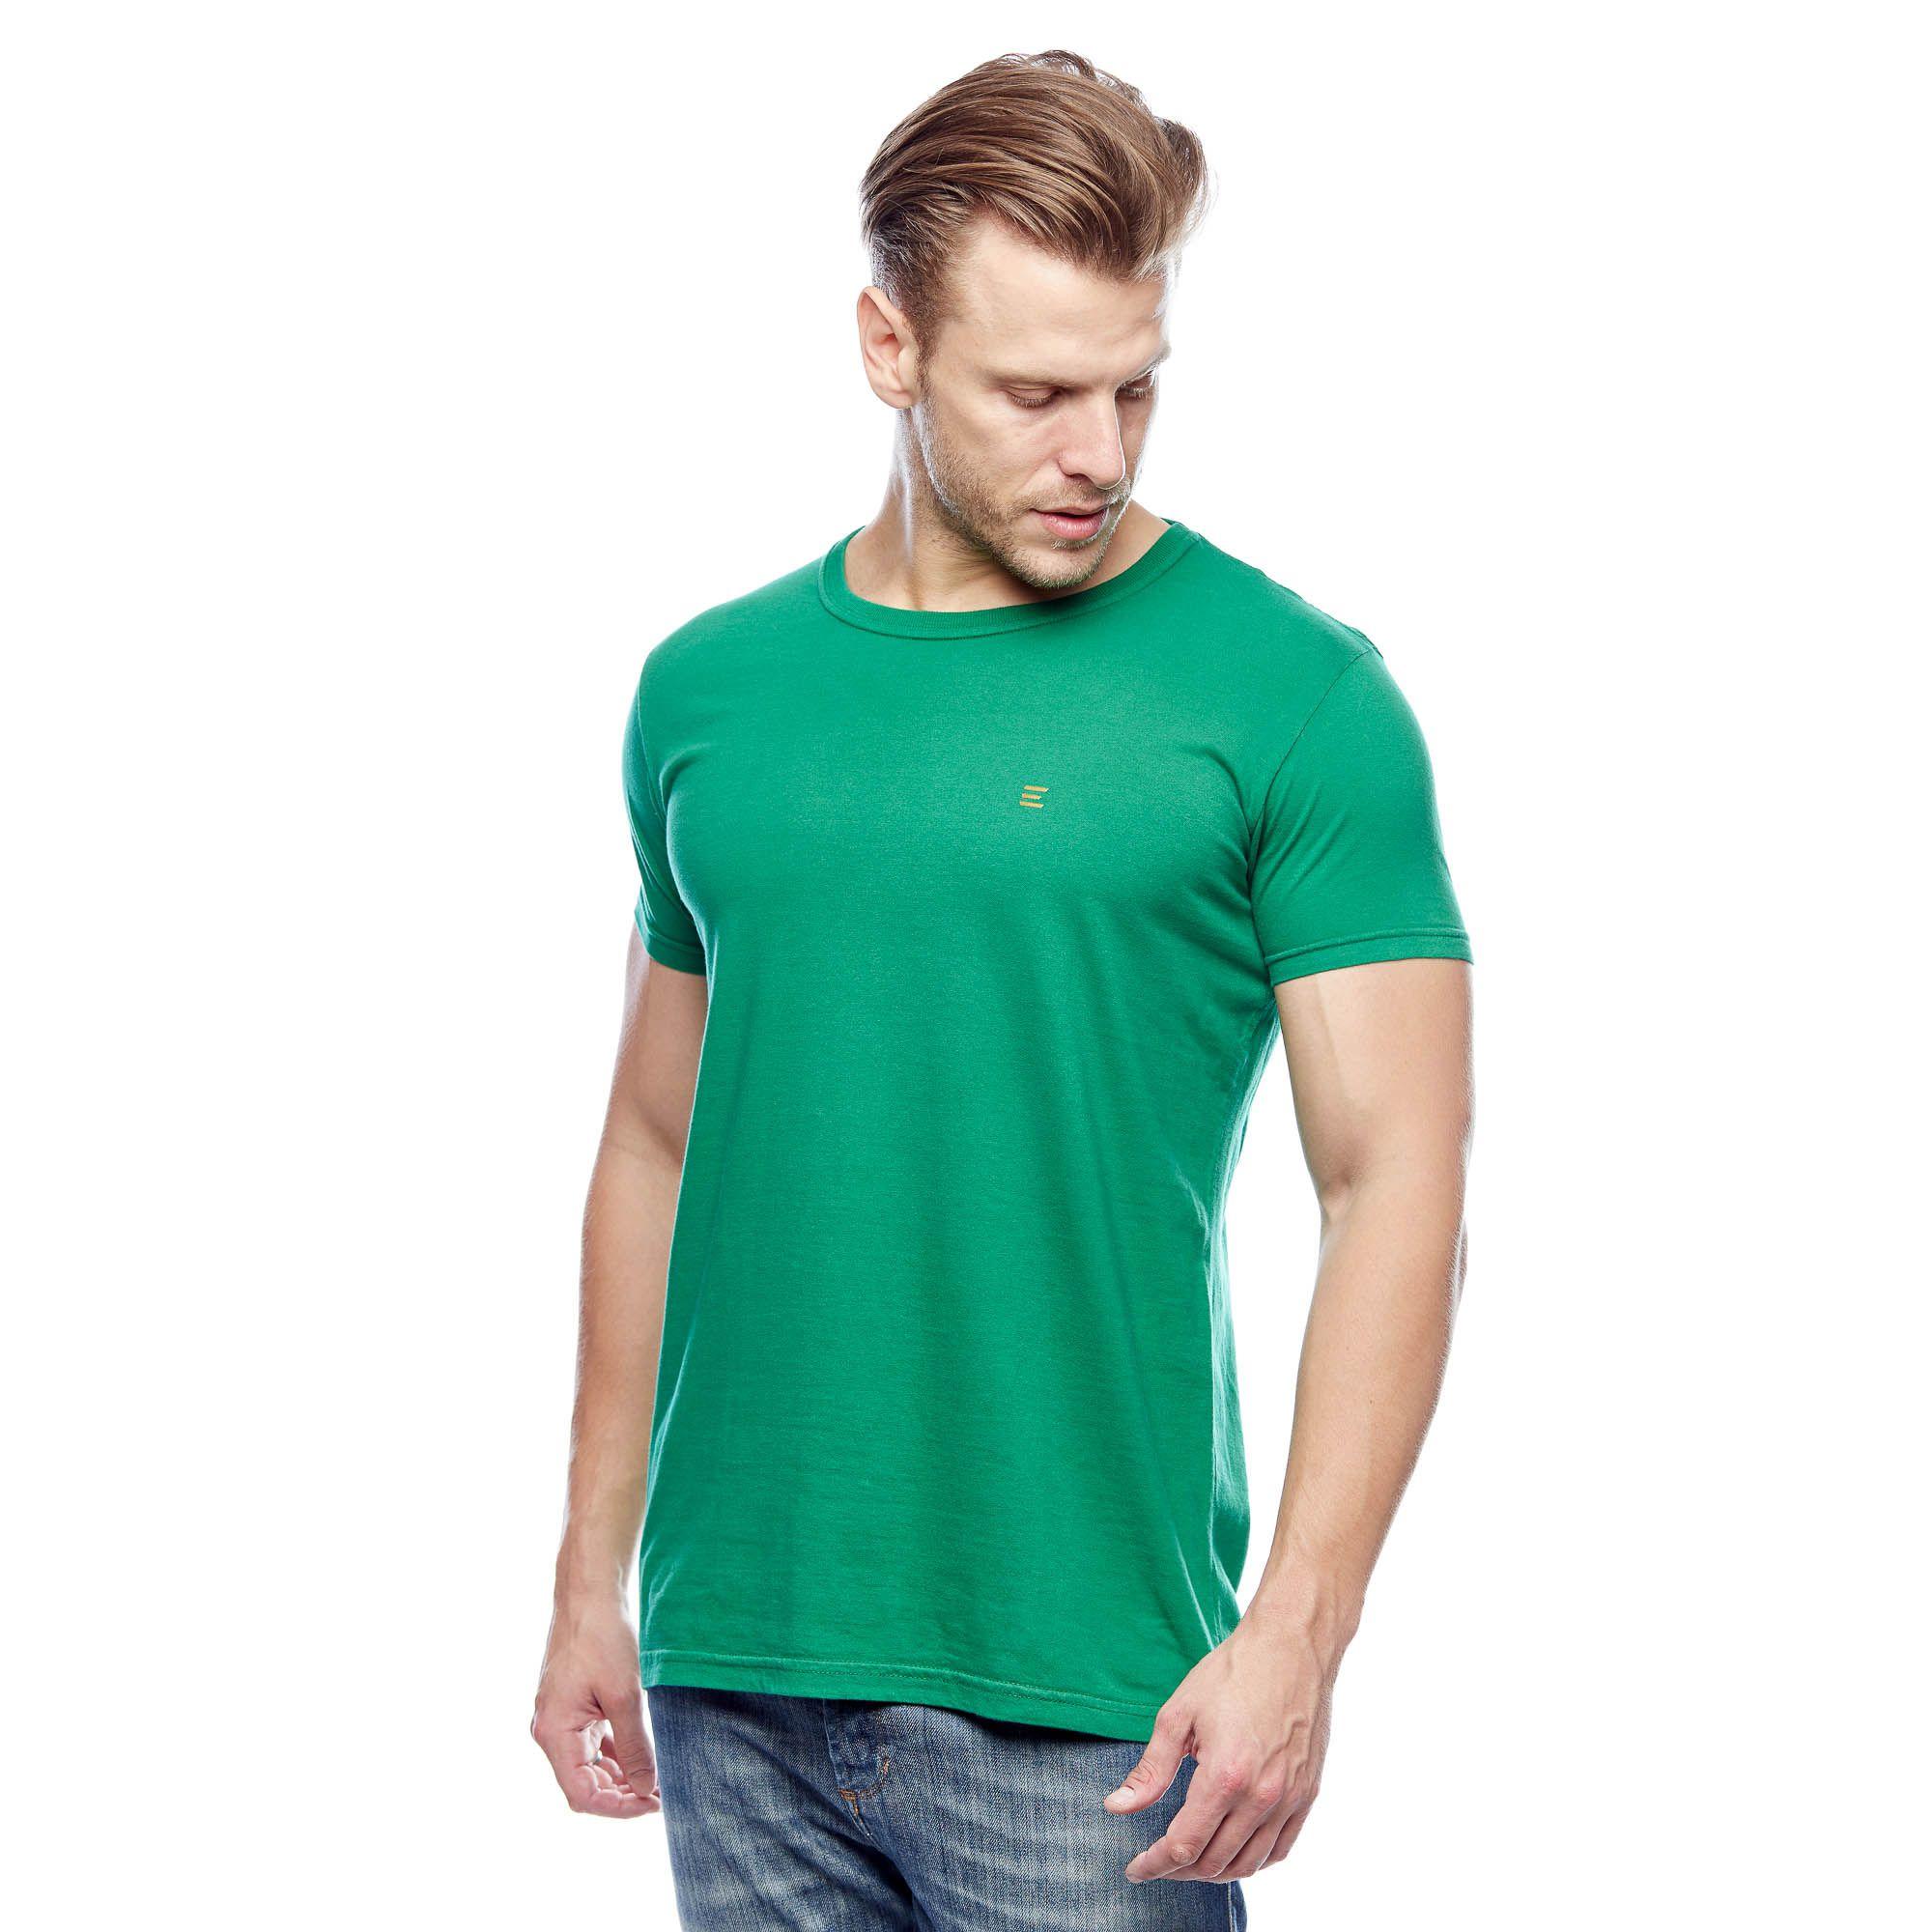 Camiseta Evolvee Básica Reativo Masculina